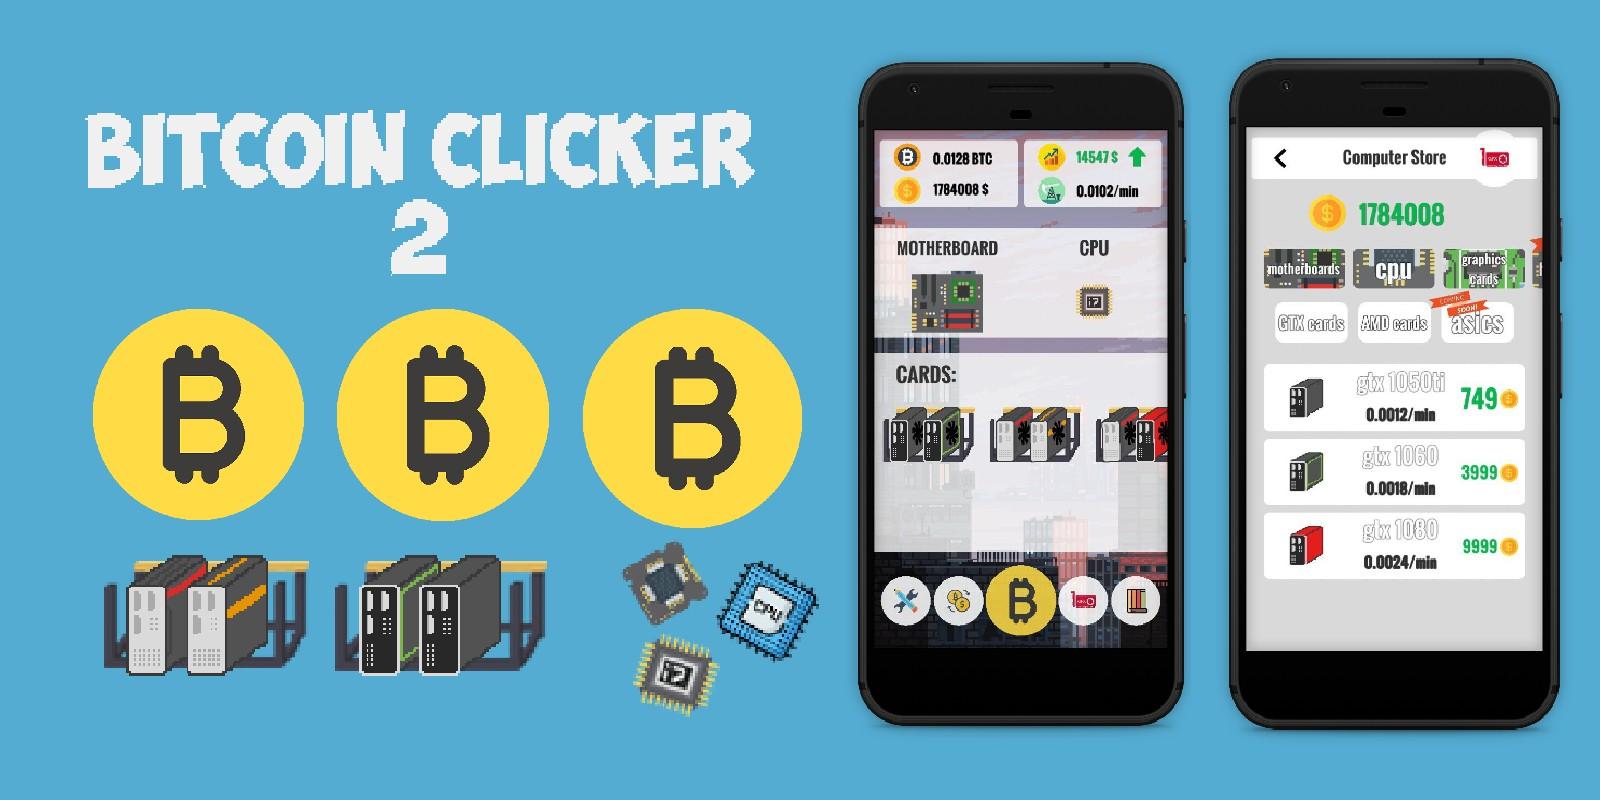 Bitcoin Clicker - Unity Source Code